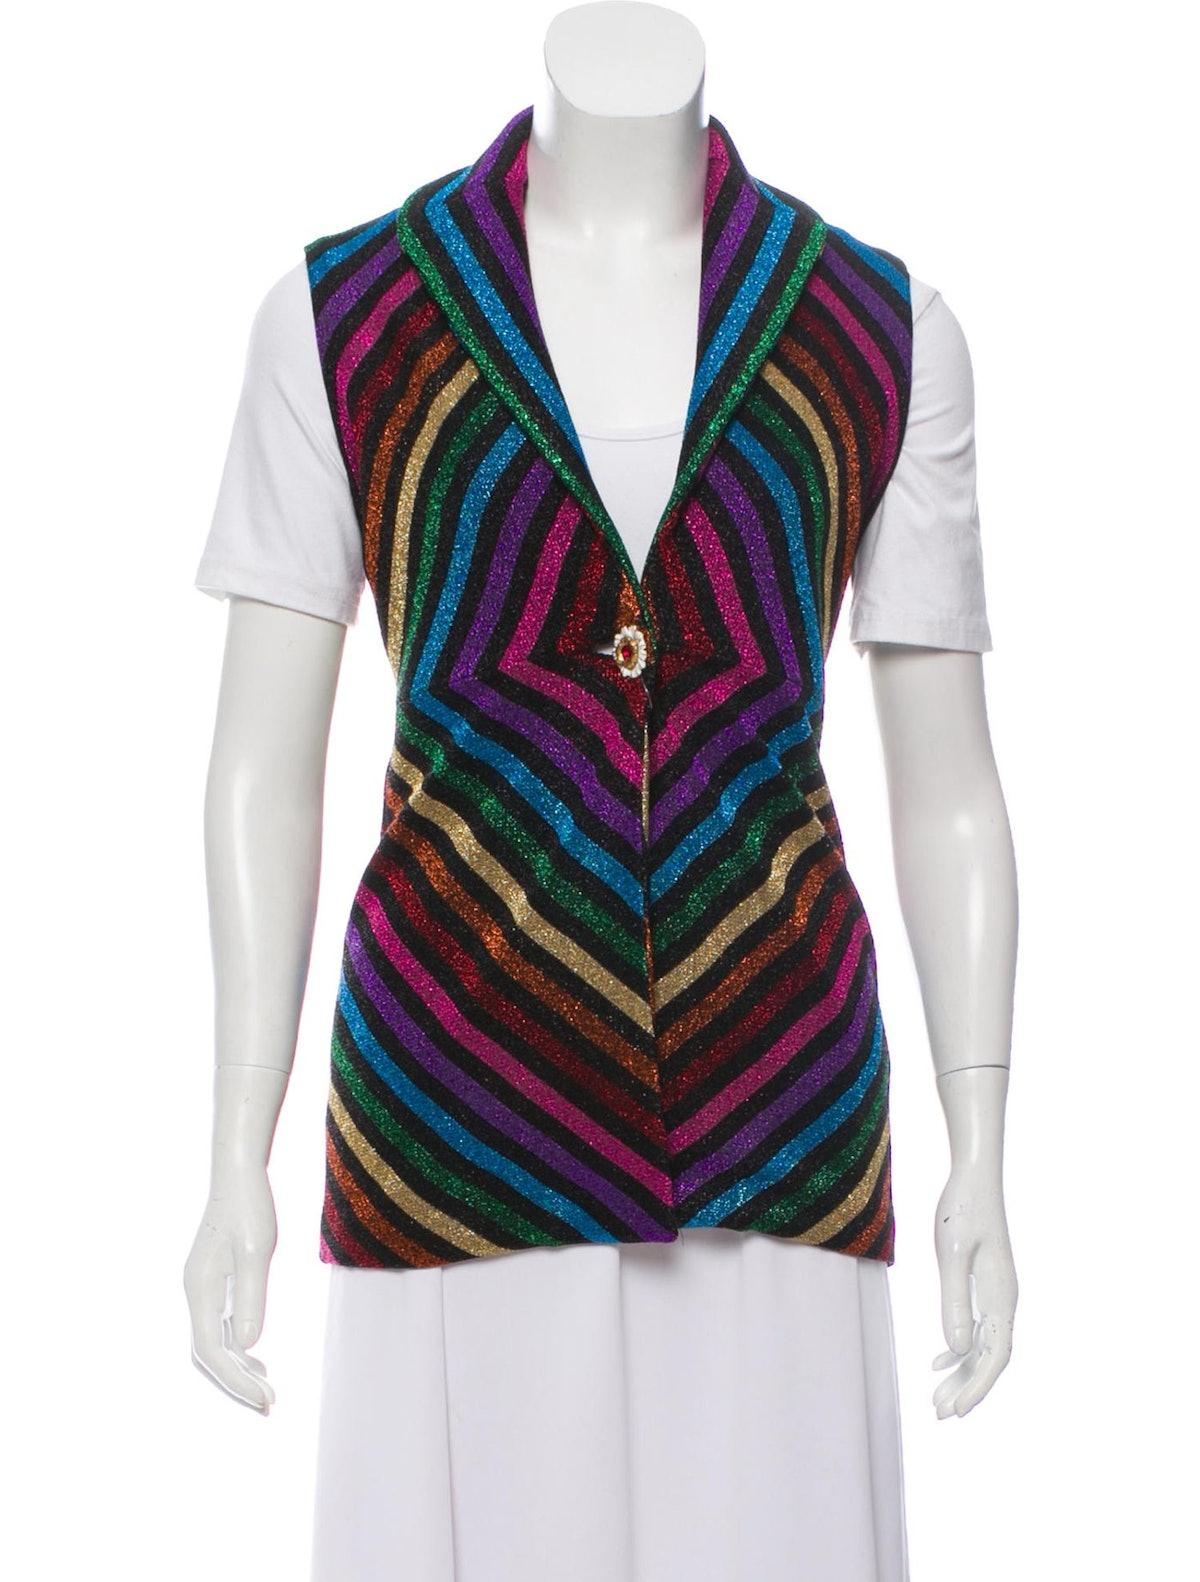 017 Rainbow Sleeveless Waistcoat